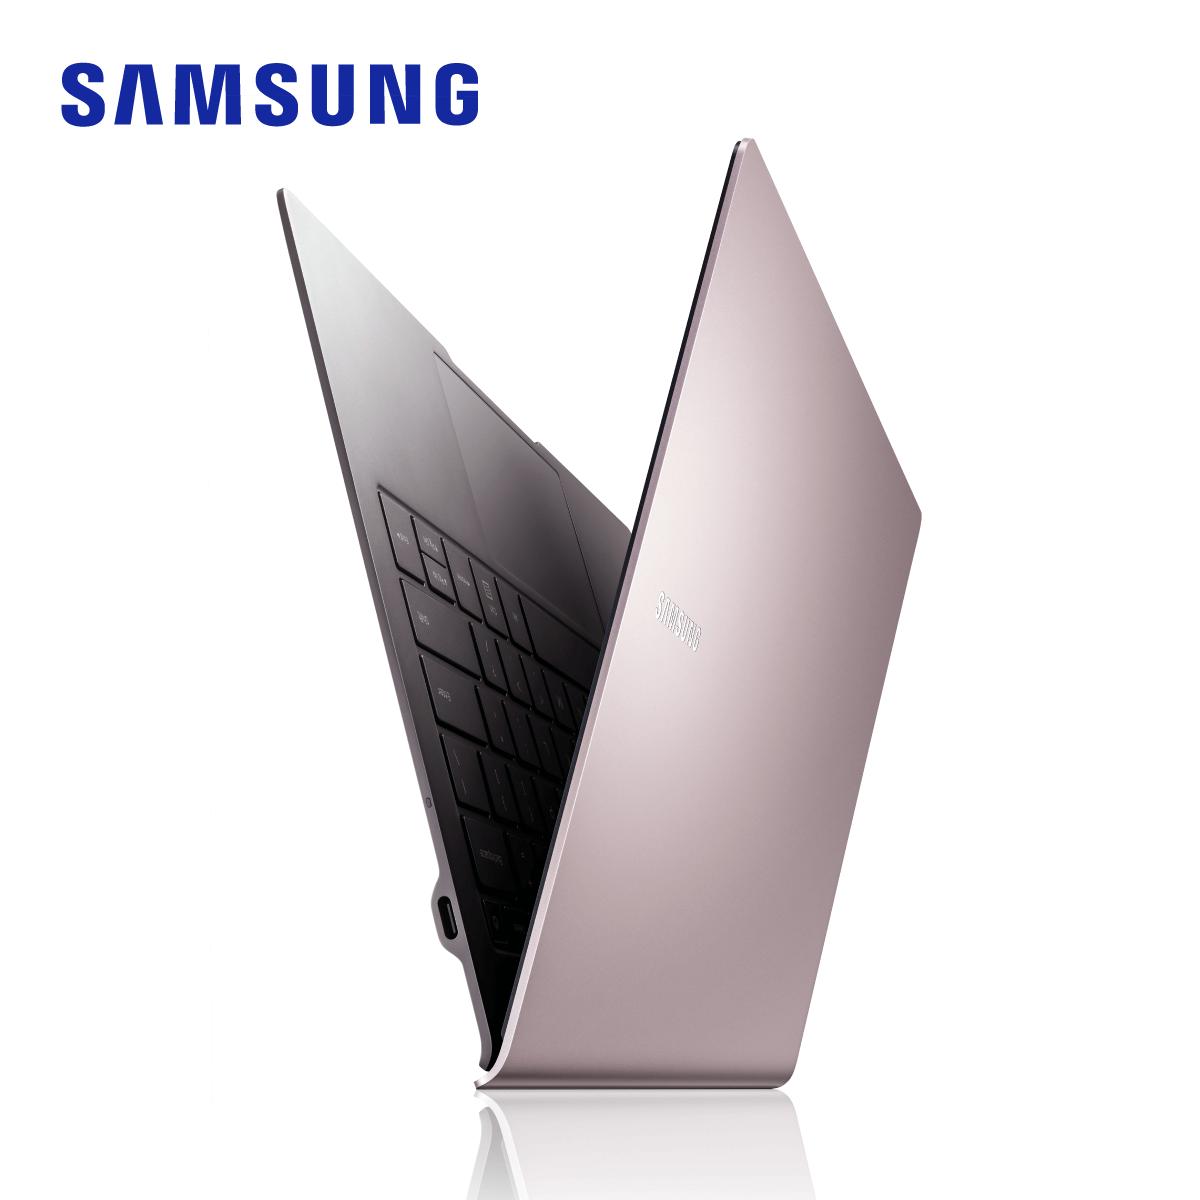 SAMSUNG Galaxy Book S 13.3